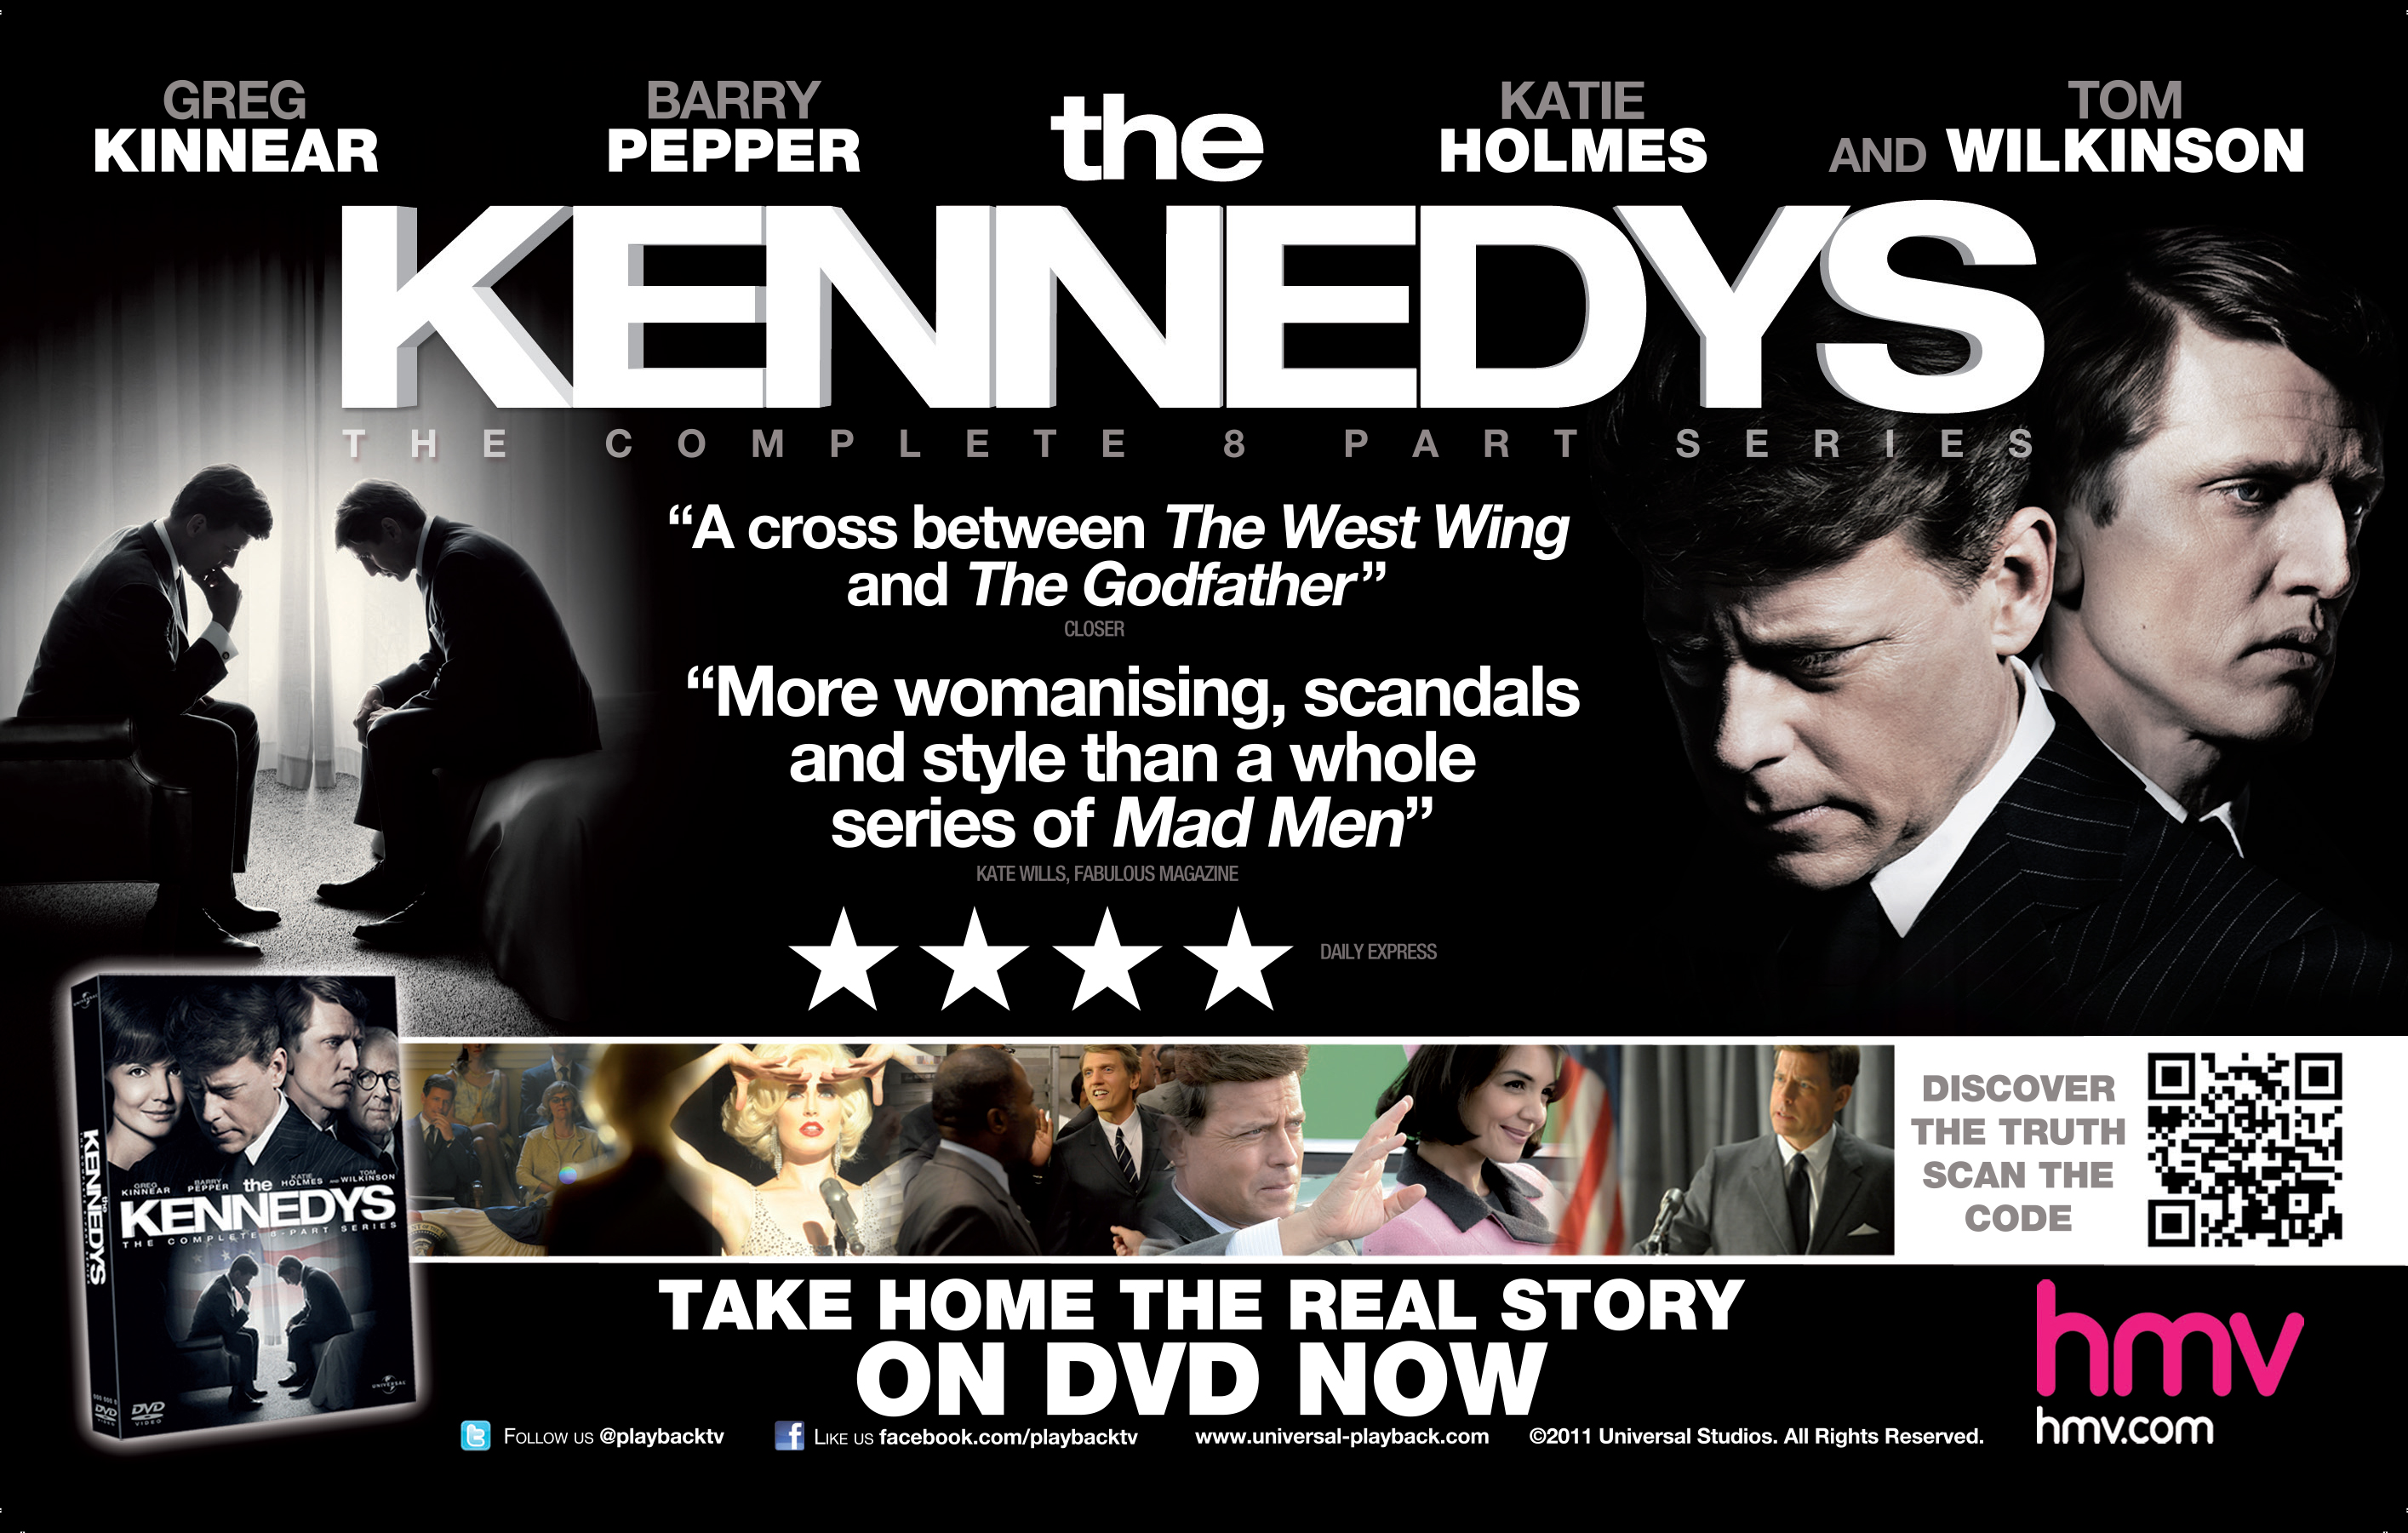 The Kennedys male skewed